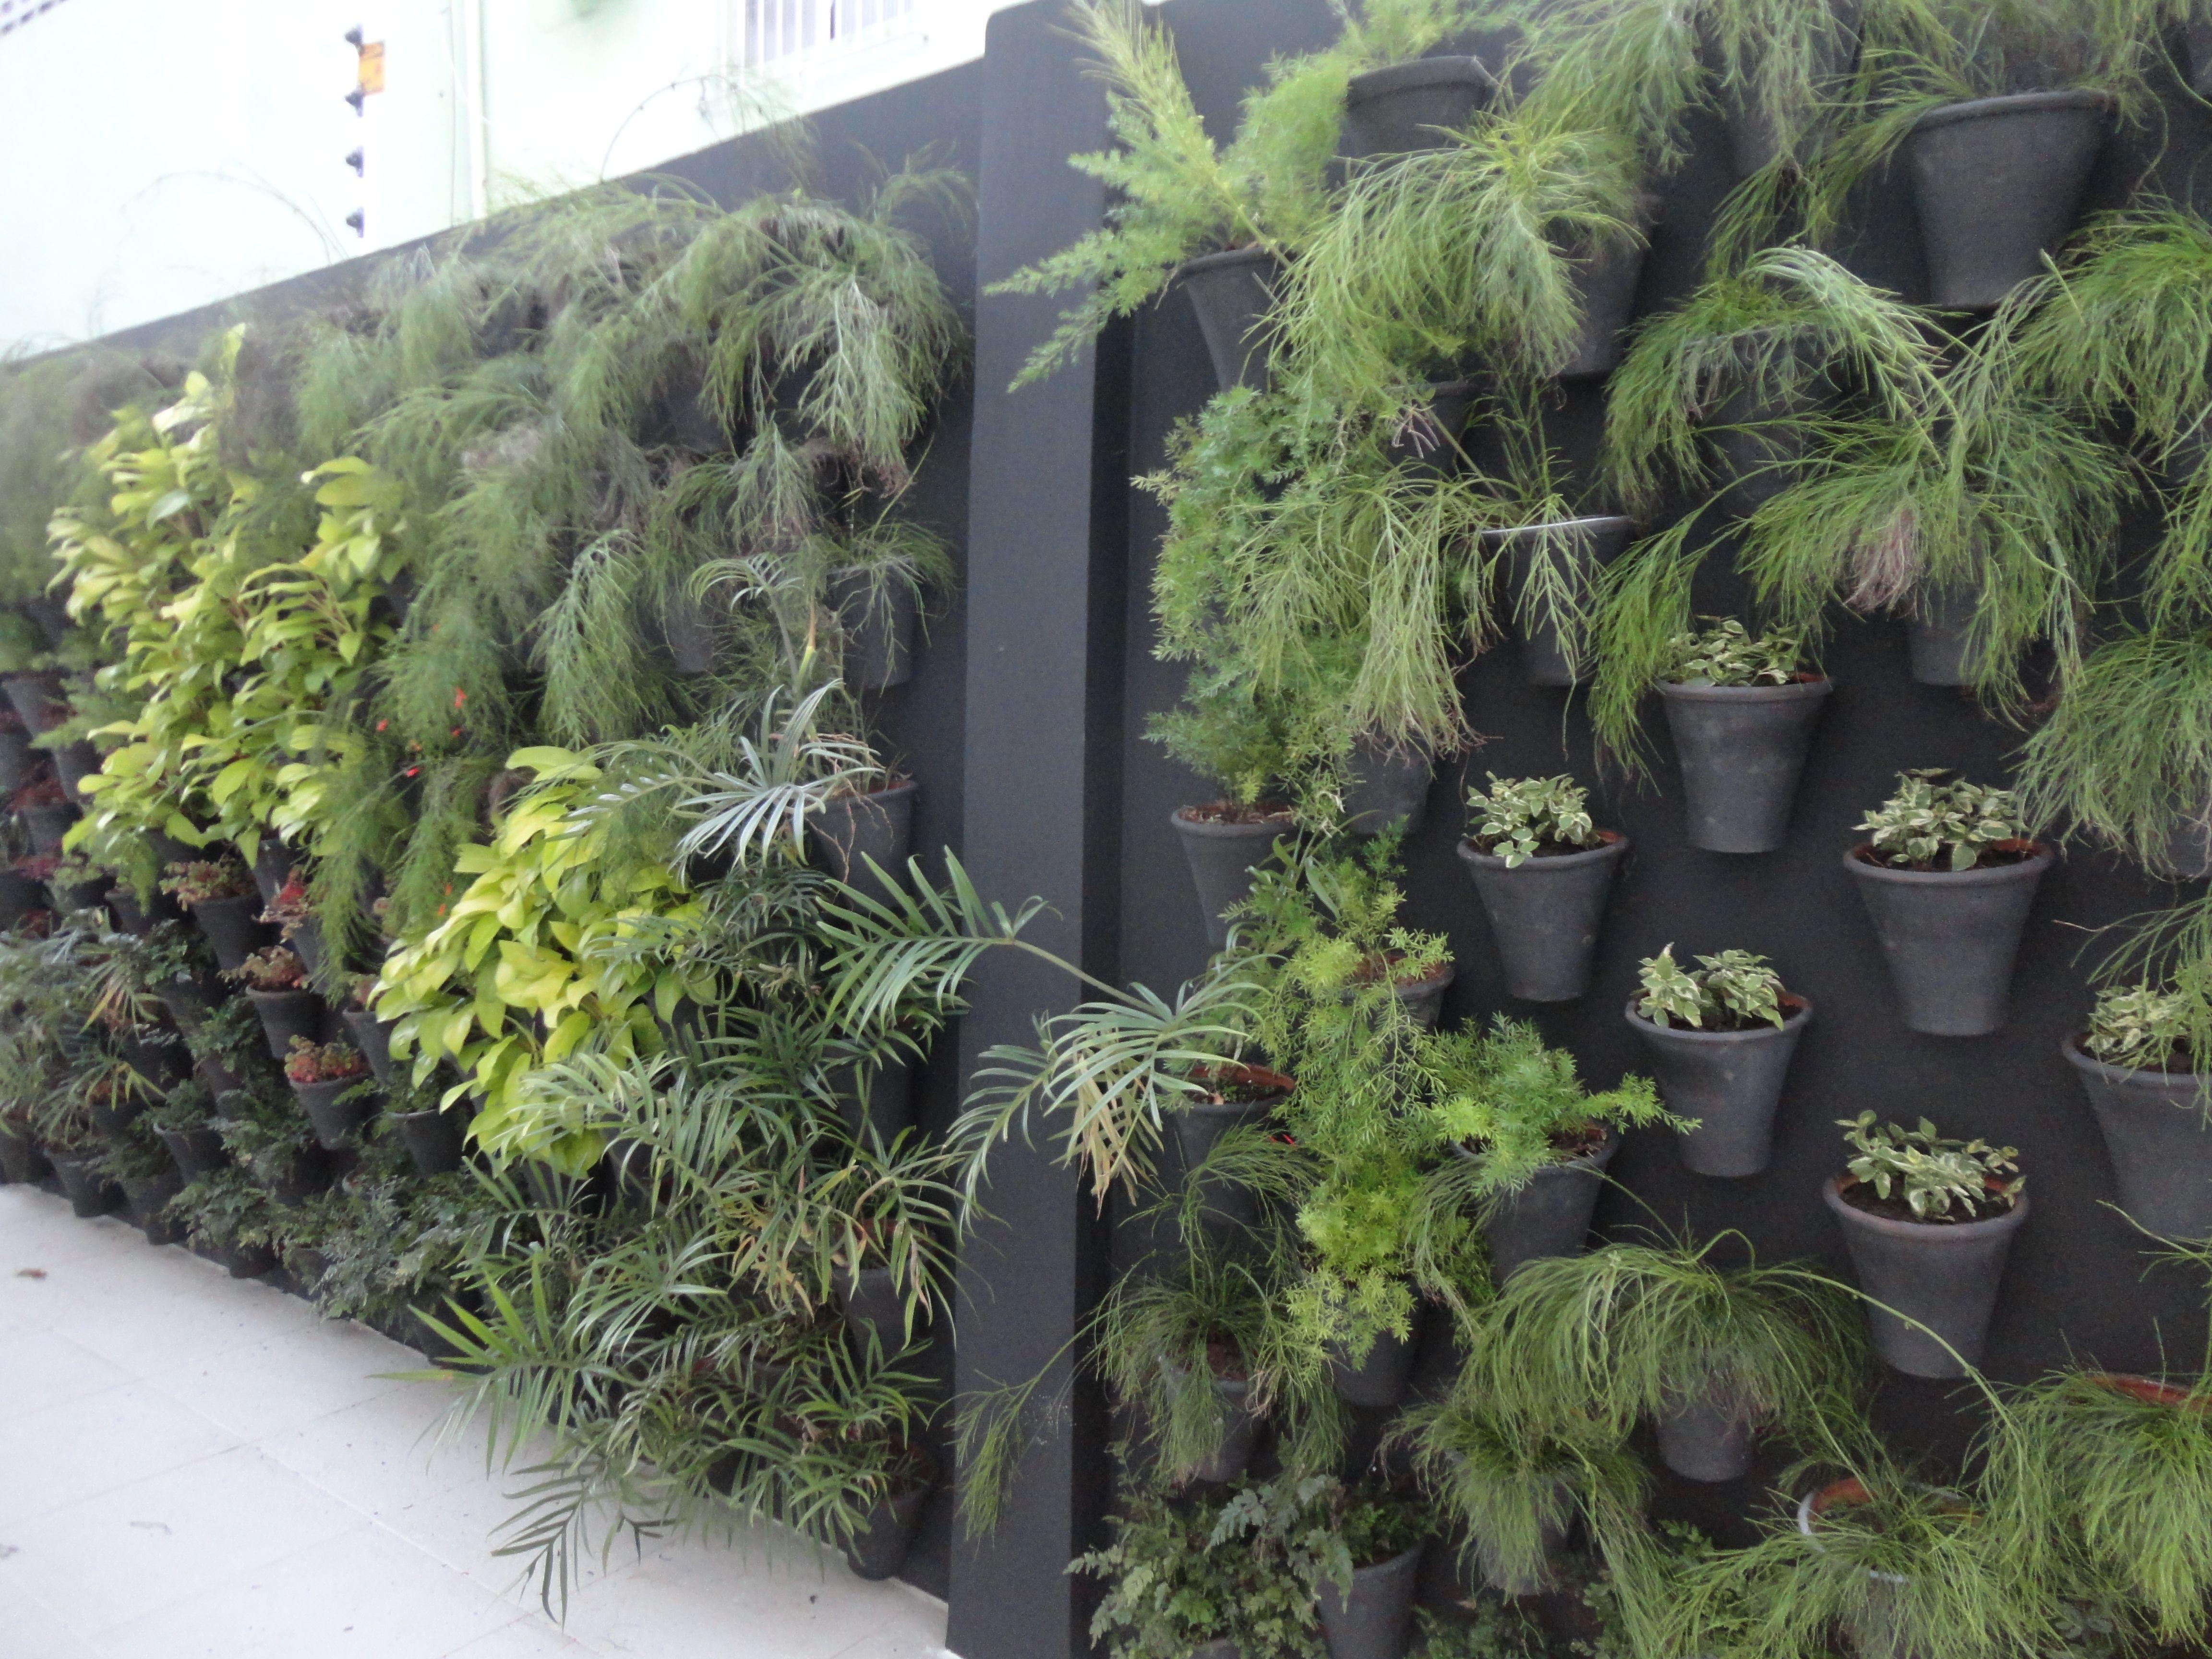 Jardim vertical feito com vasos de cerâmica. Jardins verticais  #7C8C3F 4608x3456